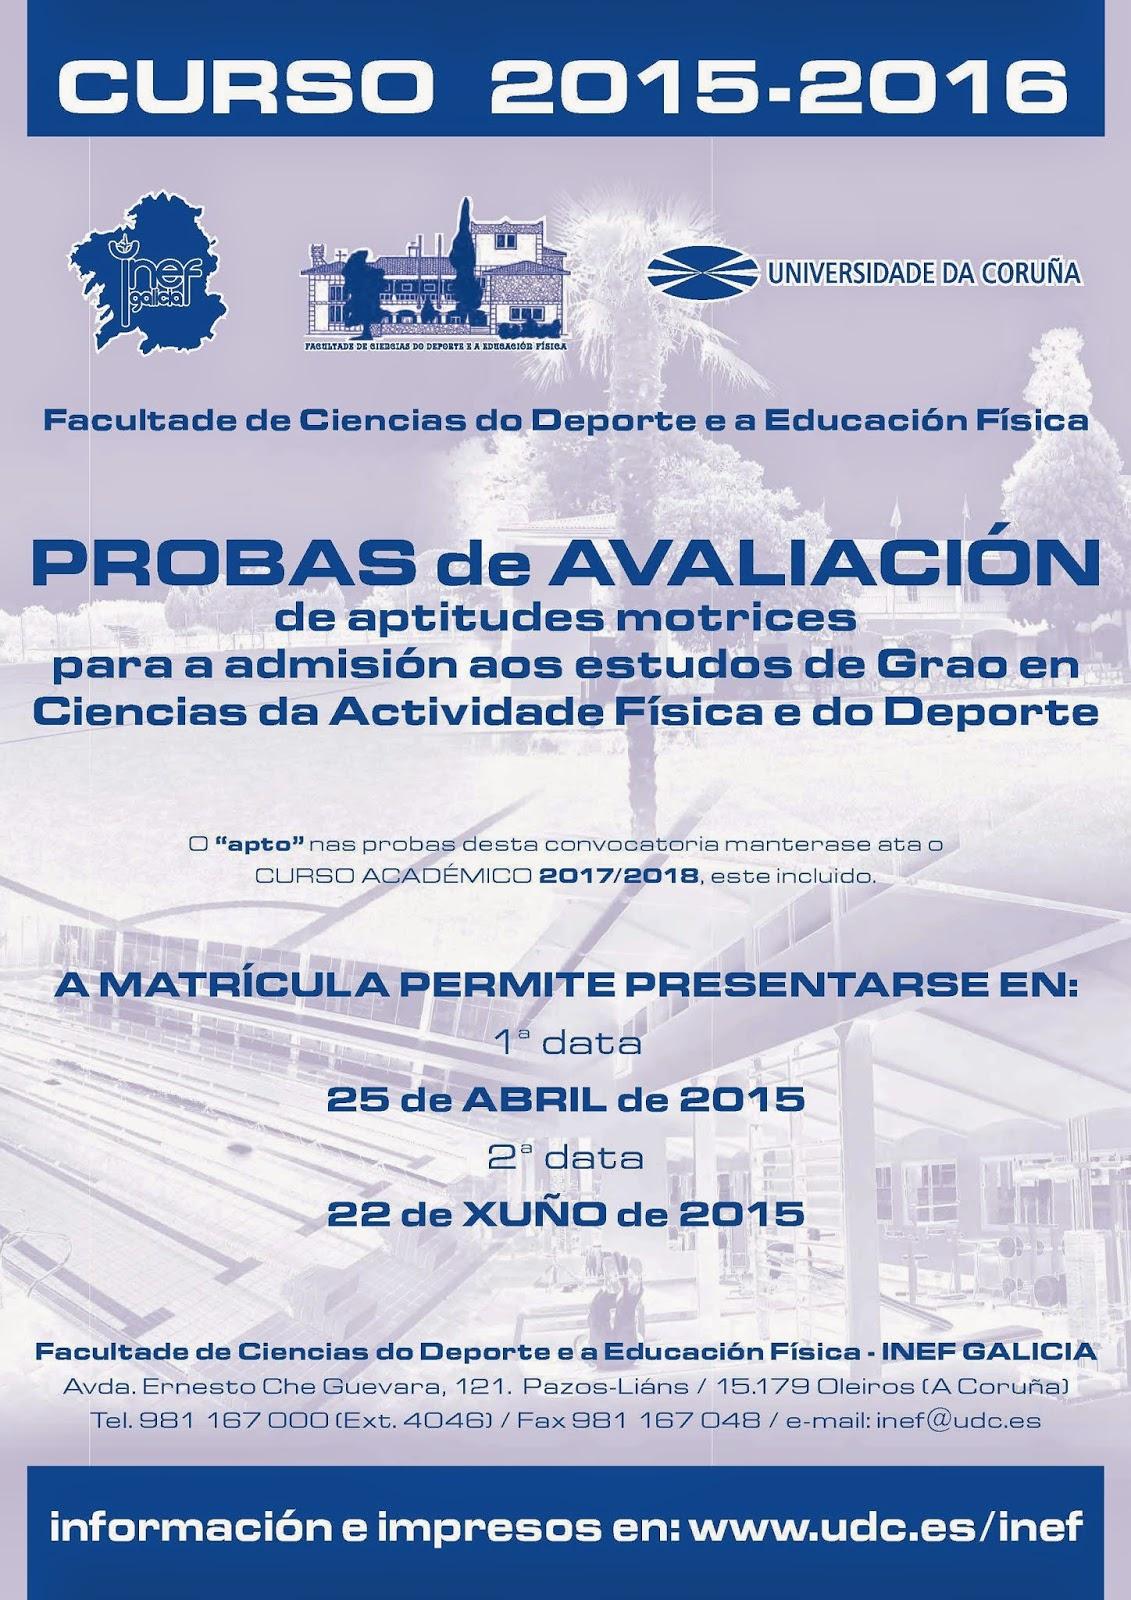 https://probasinefgalicia.udc.es/inscricion/paxina-inicio.htm